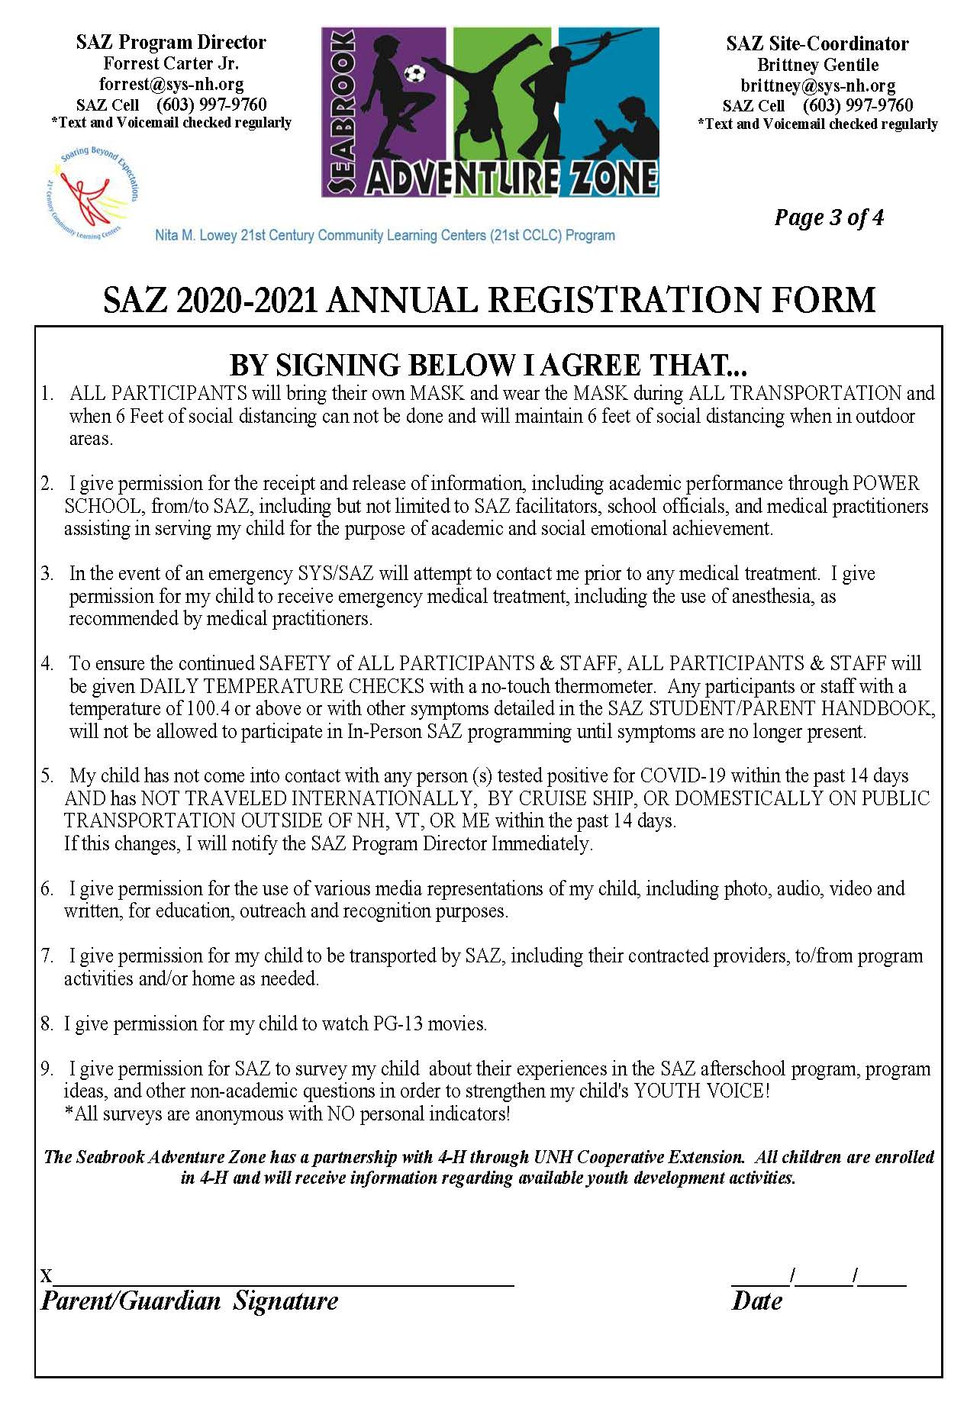 SAZ 2020-2021 Annual Registration Form